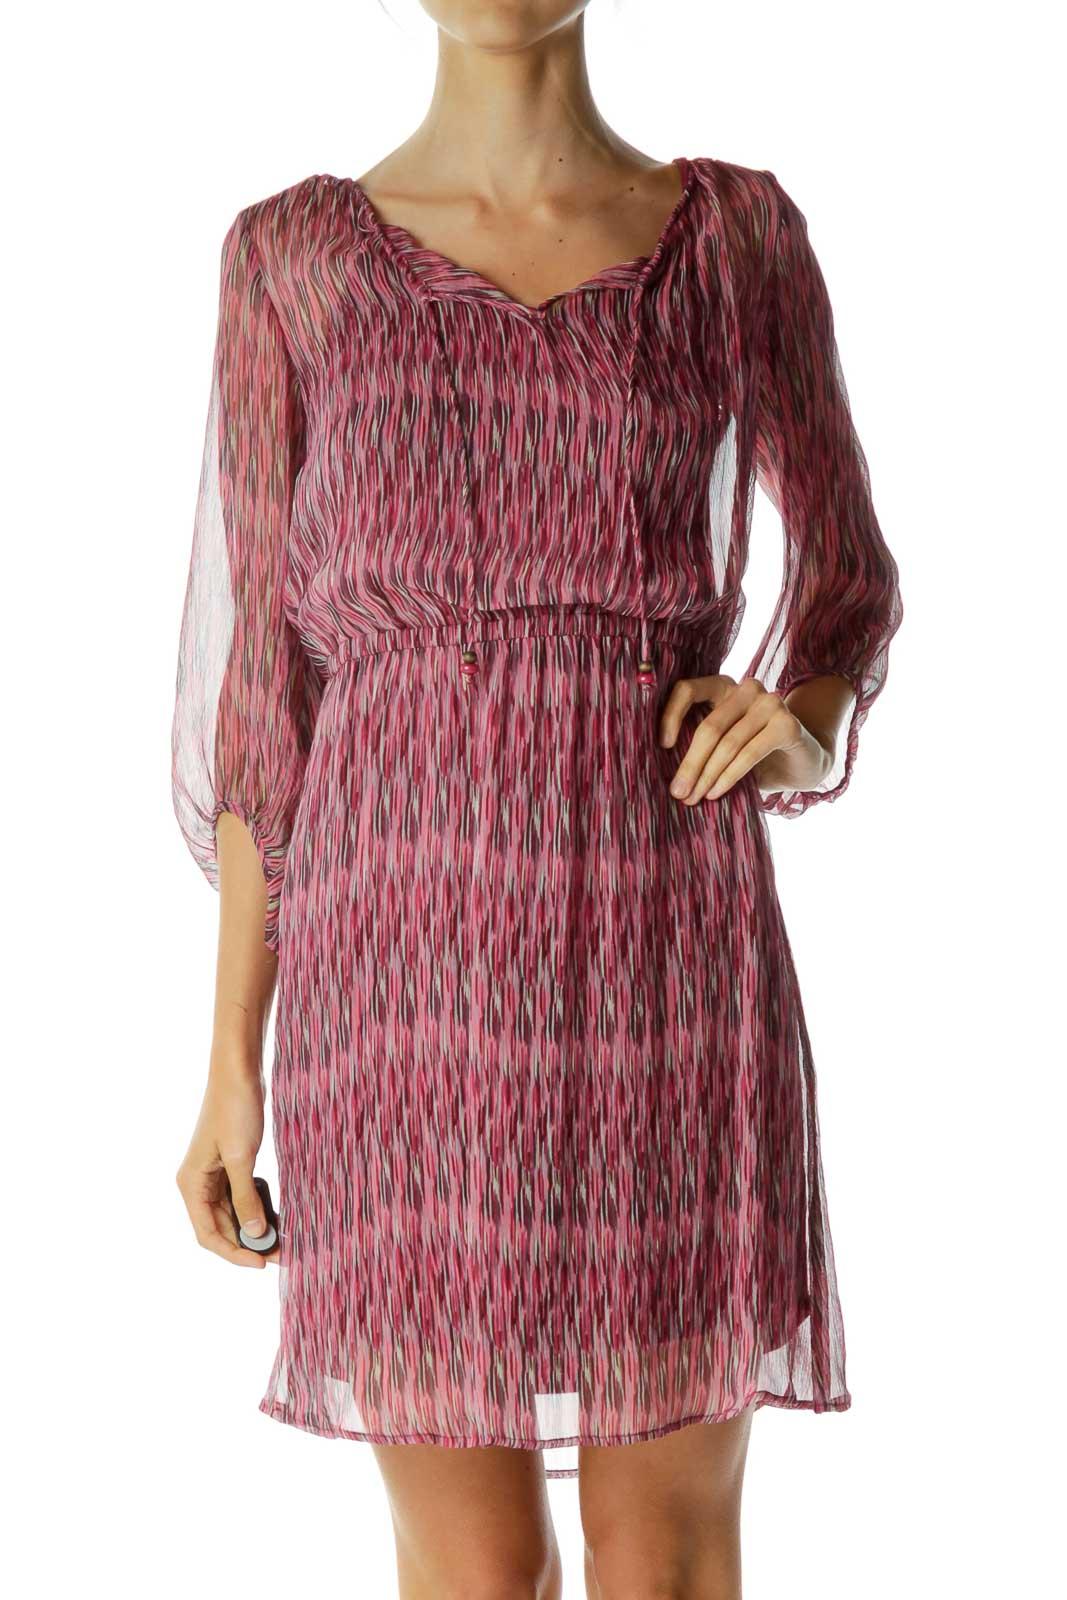 Pink Stripe Print See-Through Dress Front